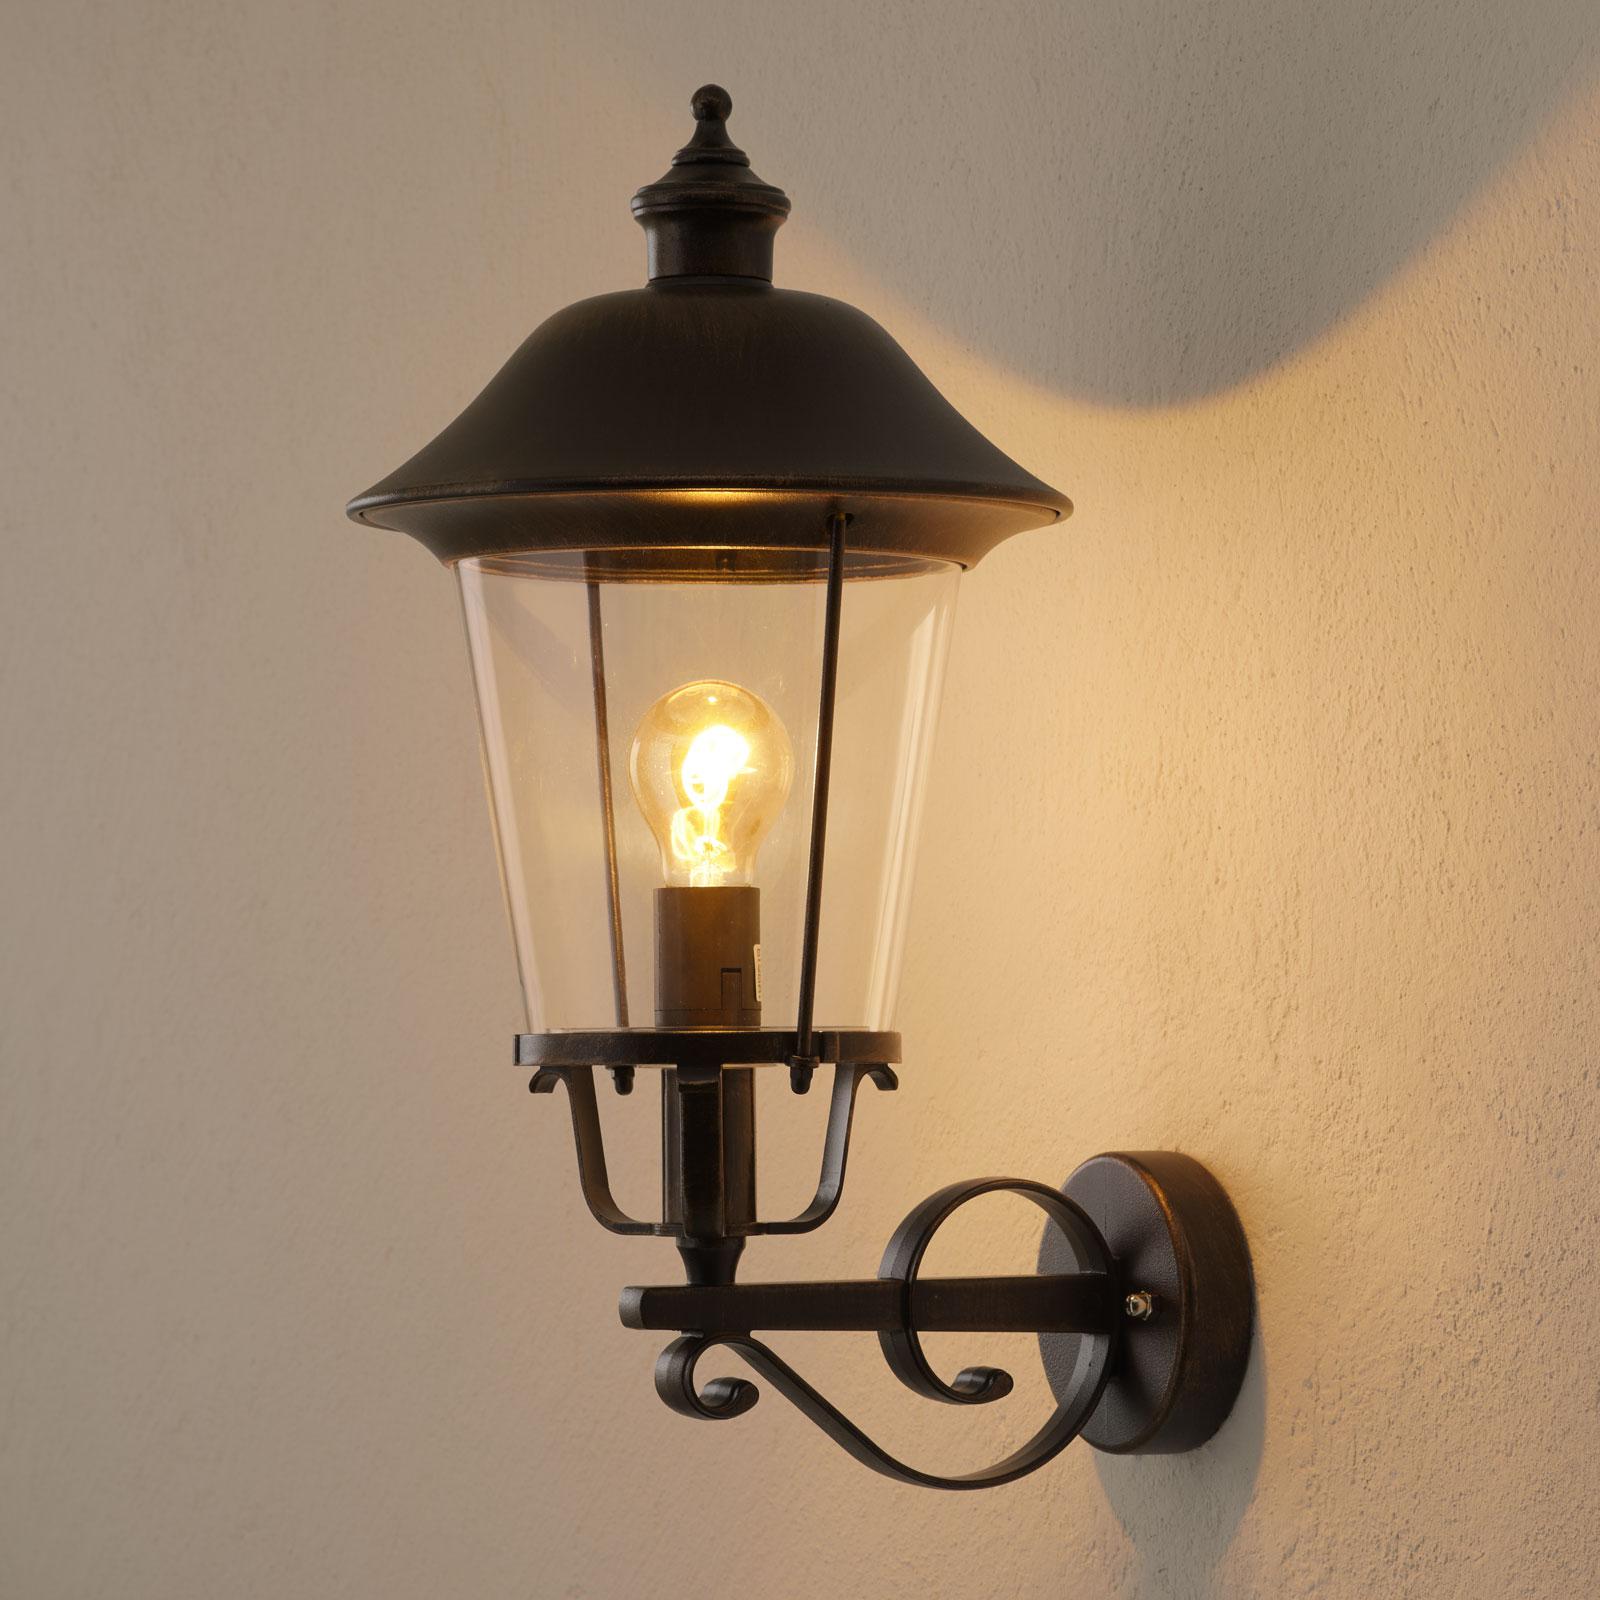 MARIELLA - omhoog gerichte buitenwandlamp